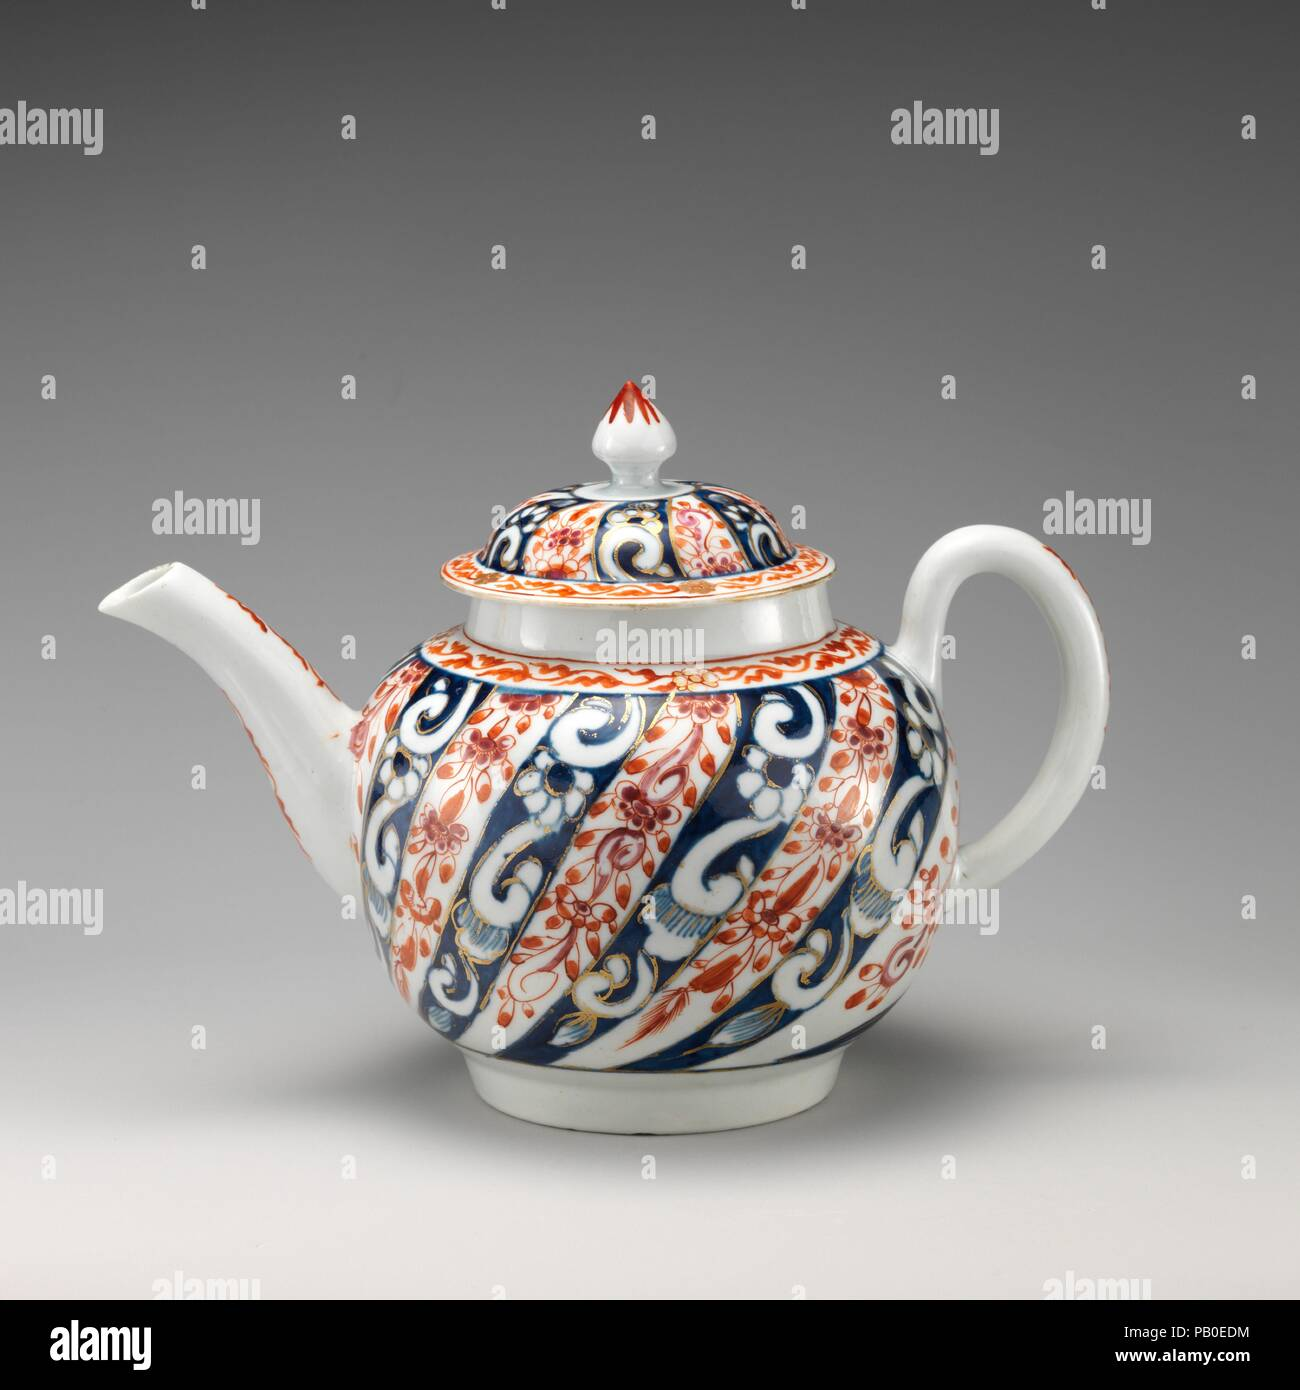 Teapot. Culture: British, Worcester. Dimensions: Height: 5 1/4 in. (13.3 cm). Factory: Worcester factory (British, 1751-2008). Date: ca. 1770-80. Museum: Metropolitan Museum of Art, New York, USA. Stock Photo